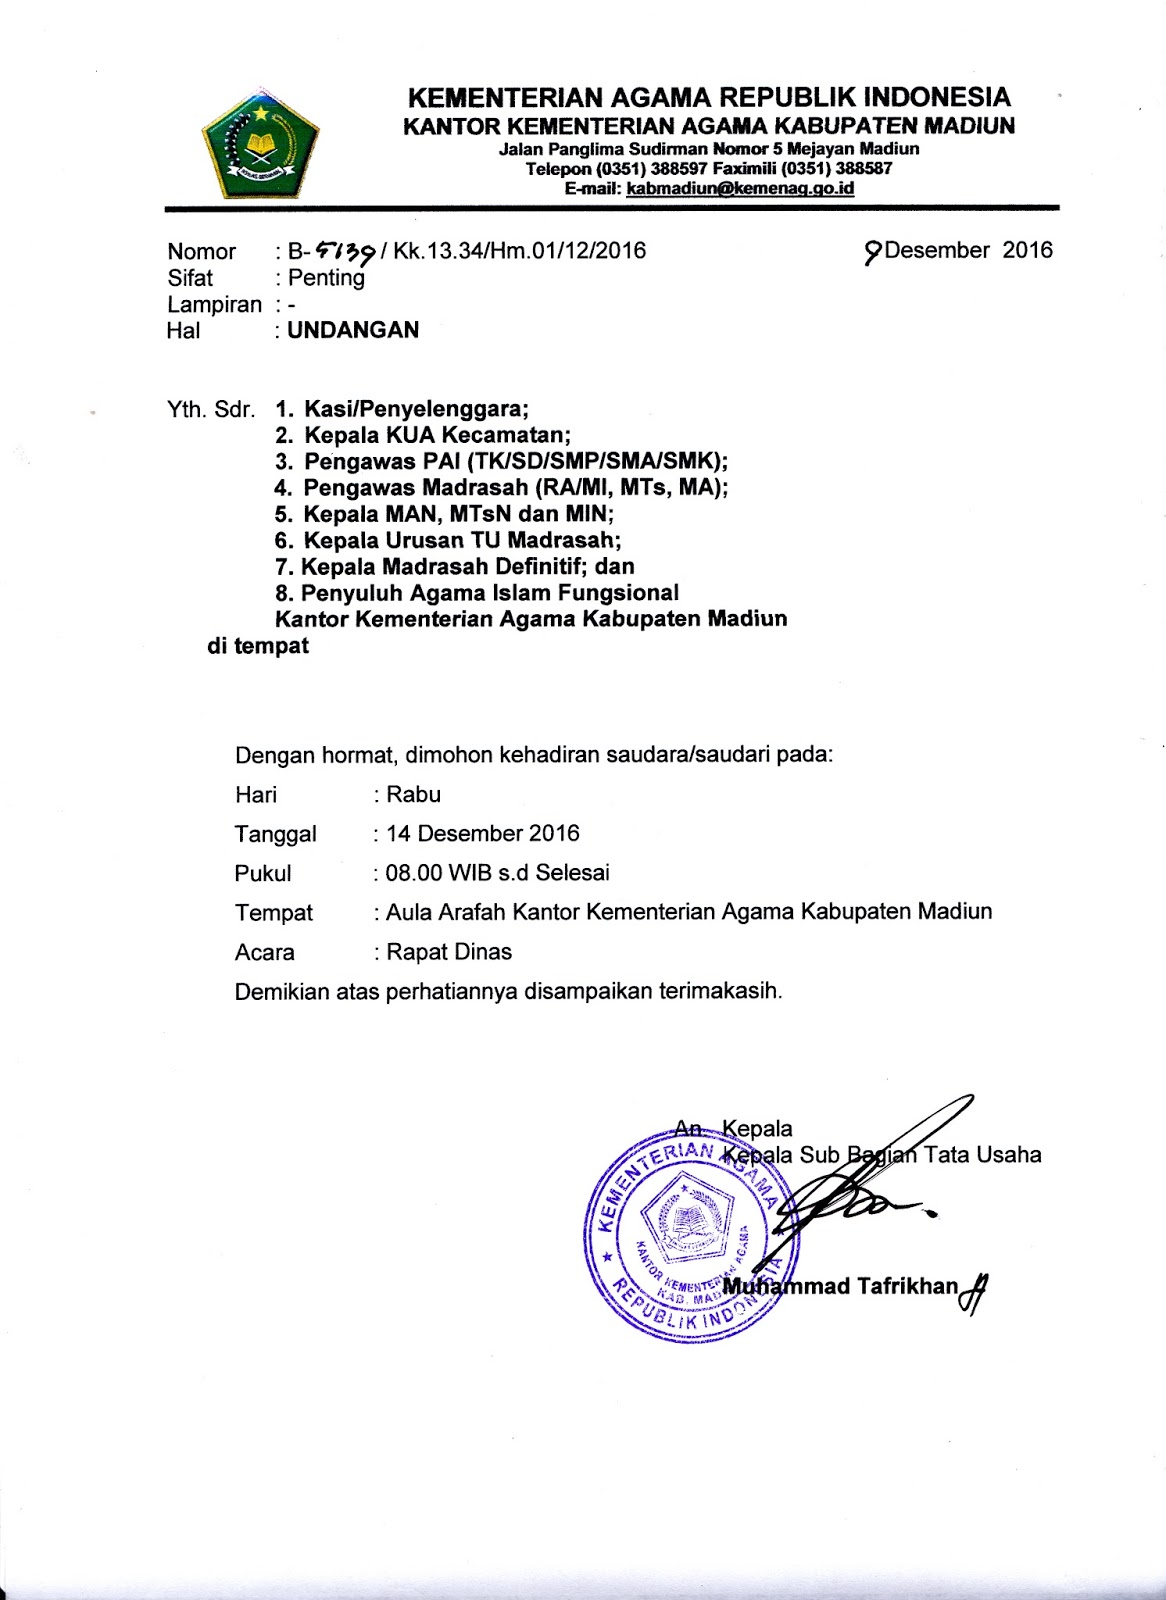 Surat Dinas Kementrian Agama